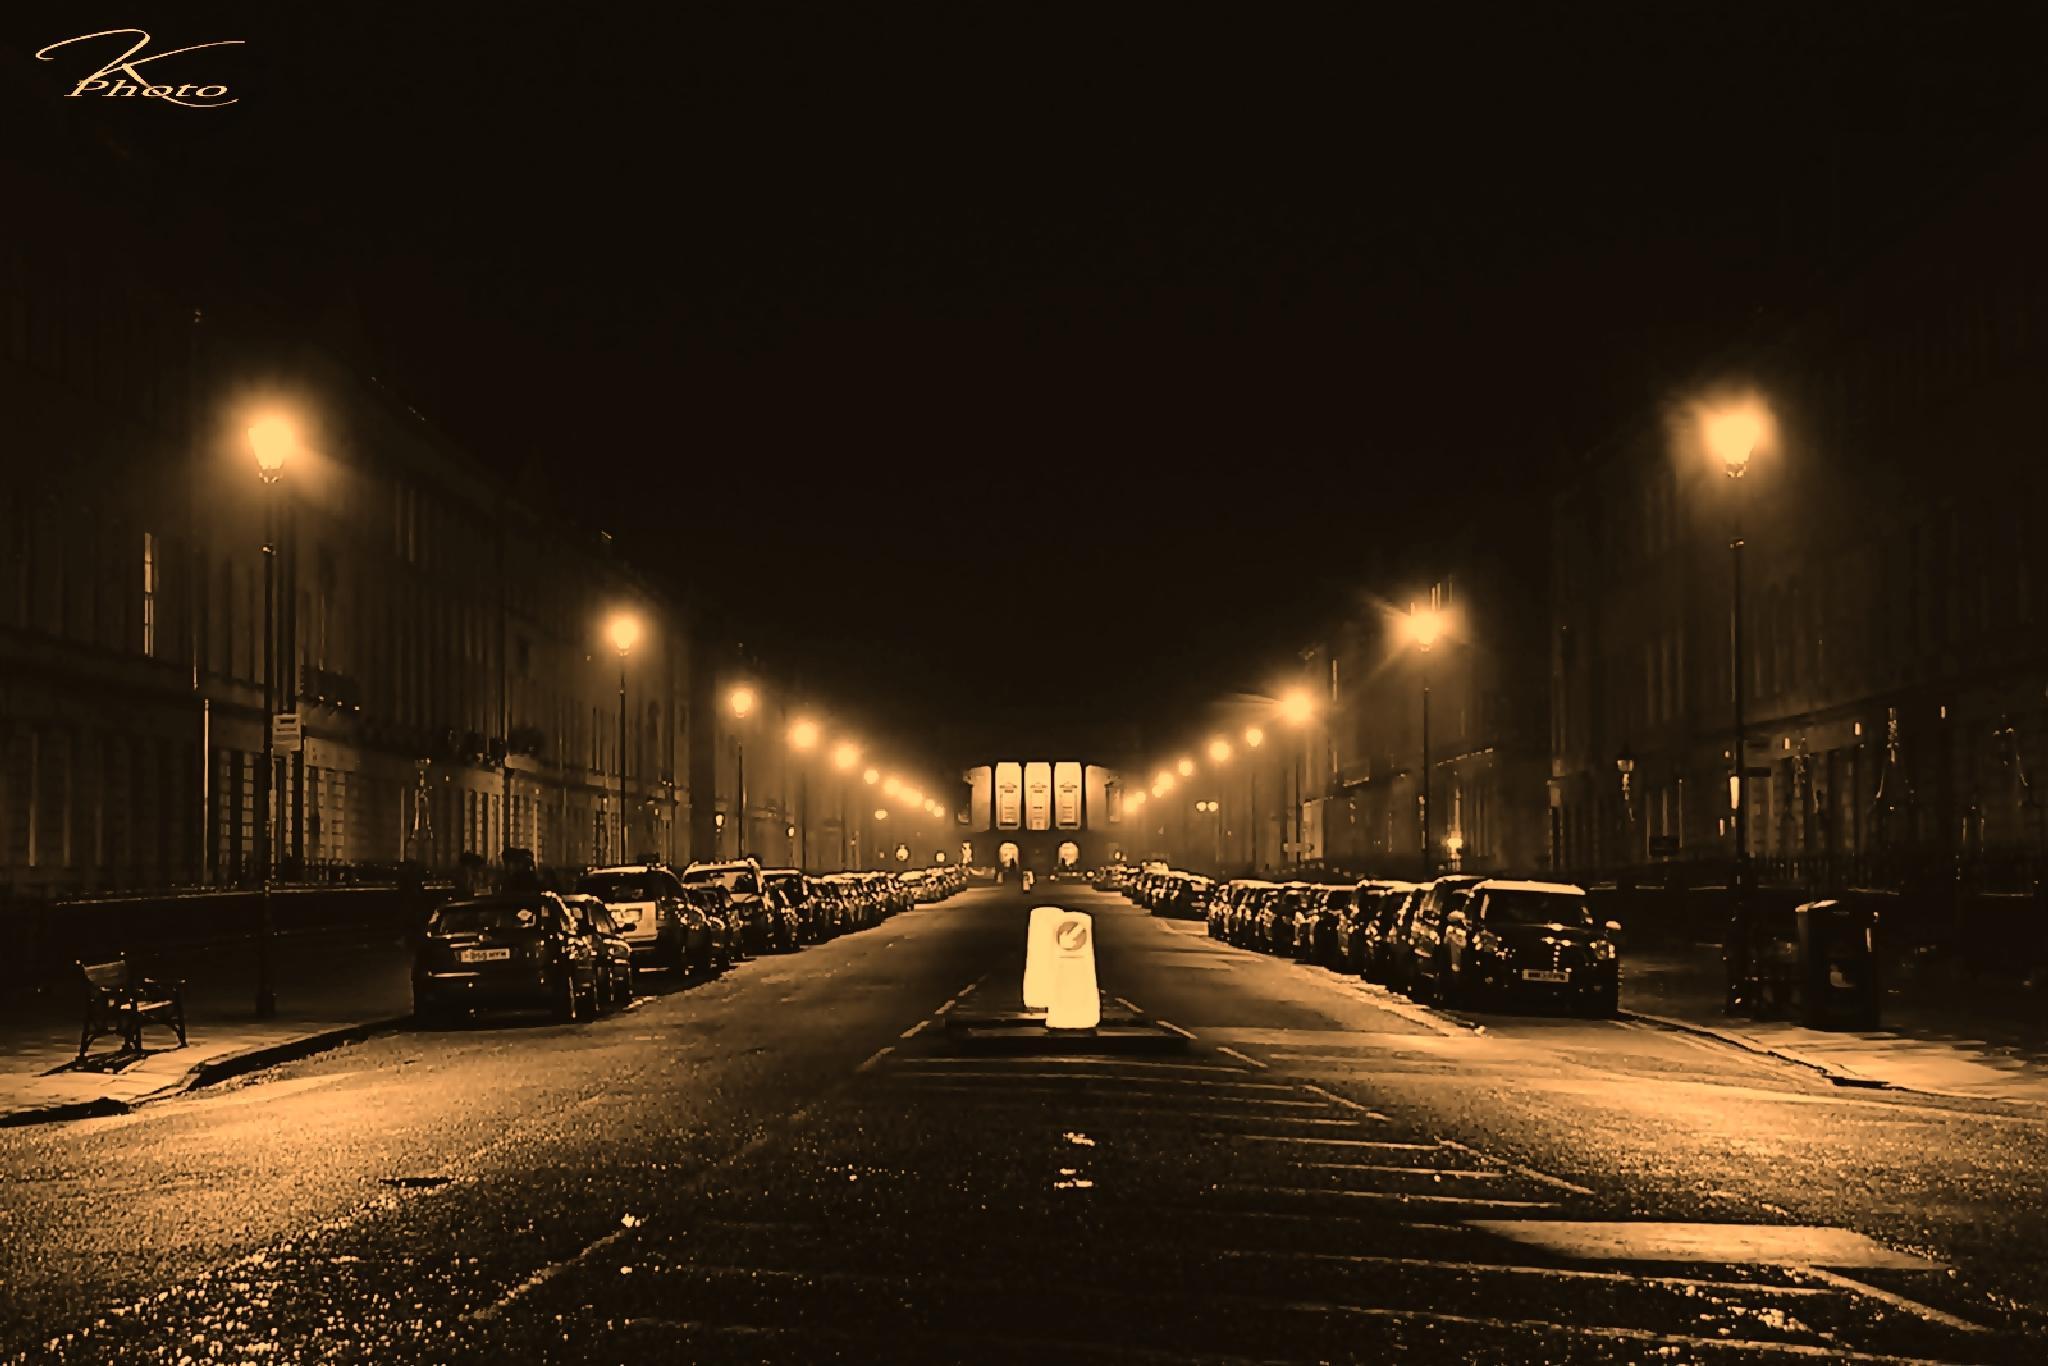 street at night by Kamil Gaweł